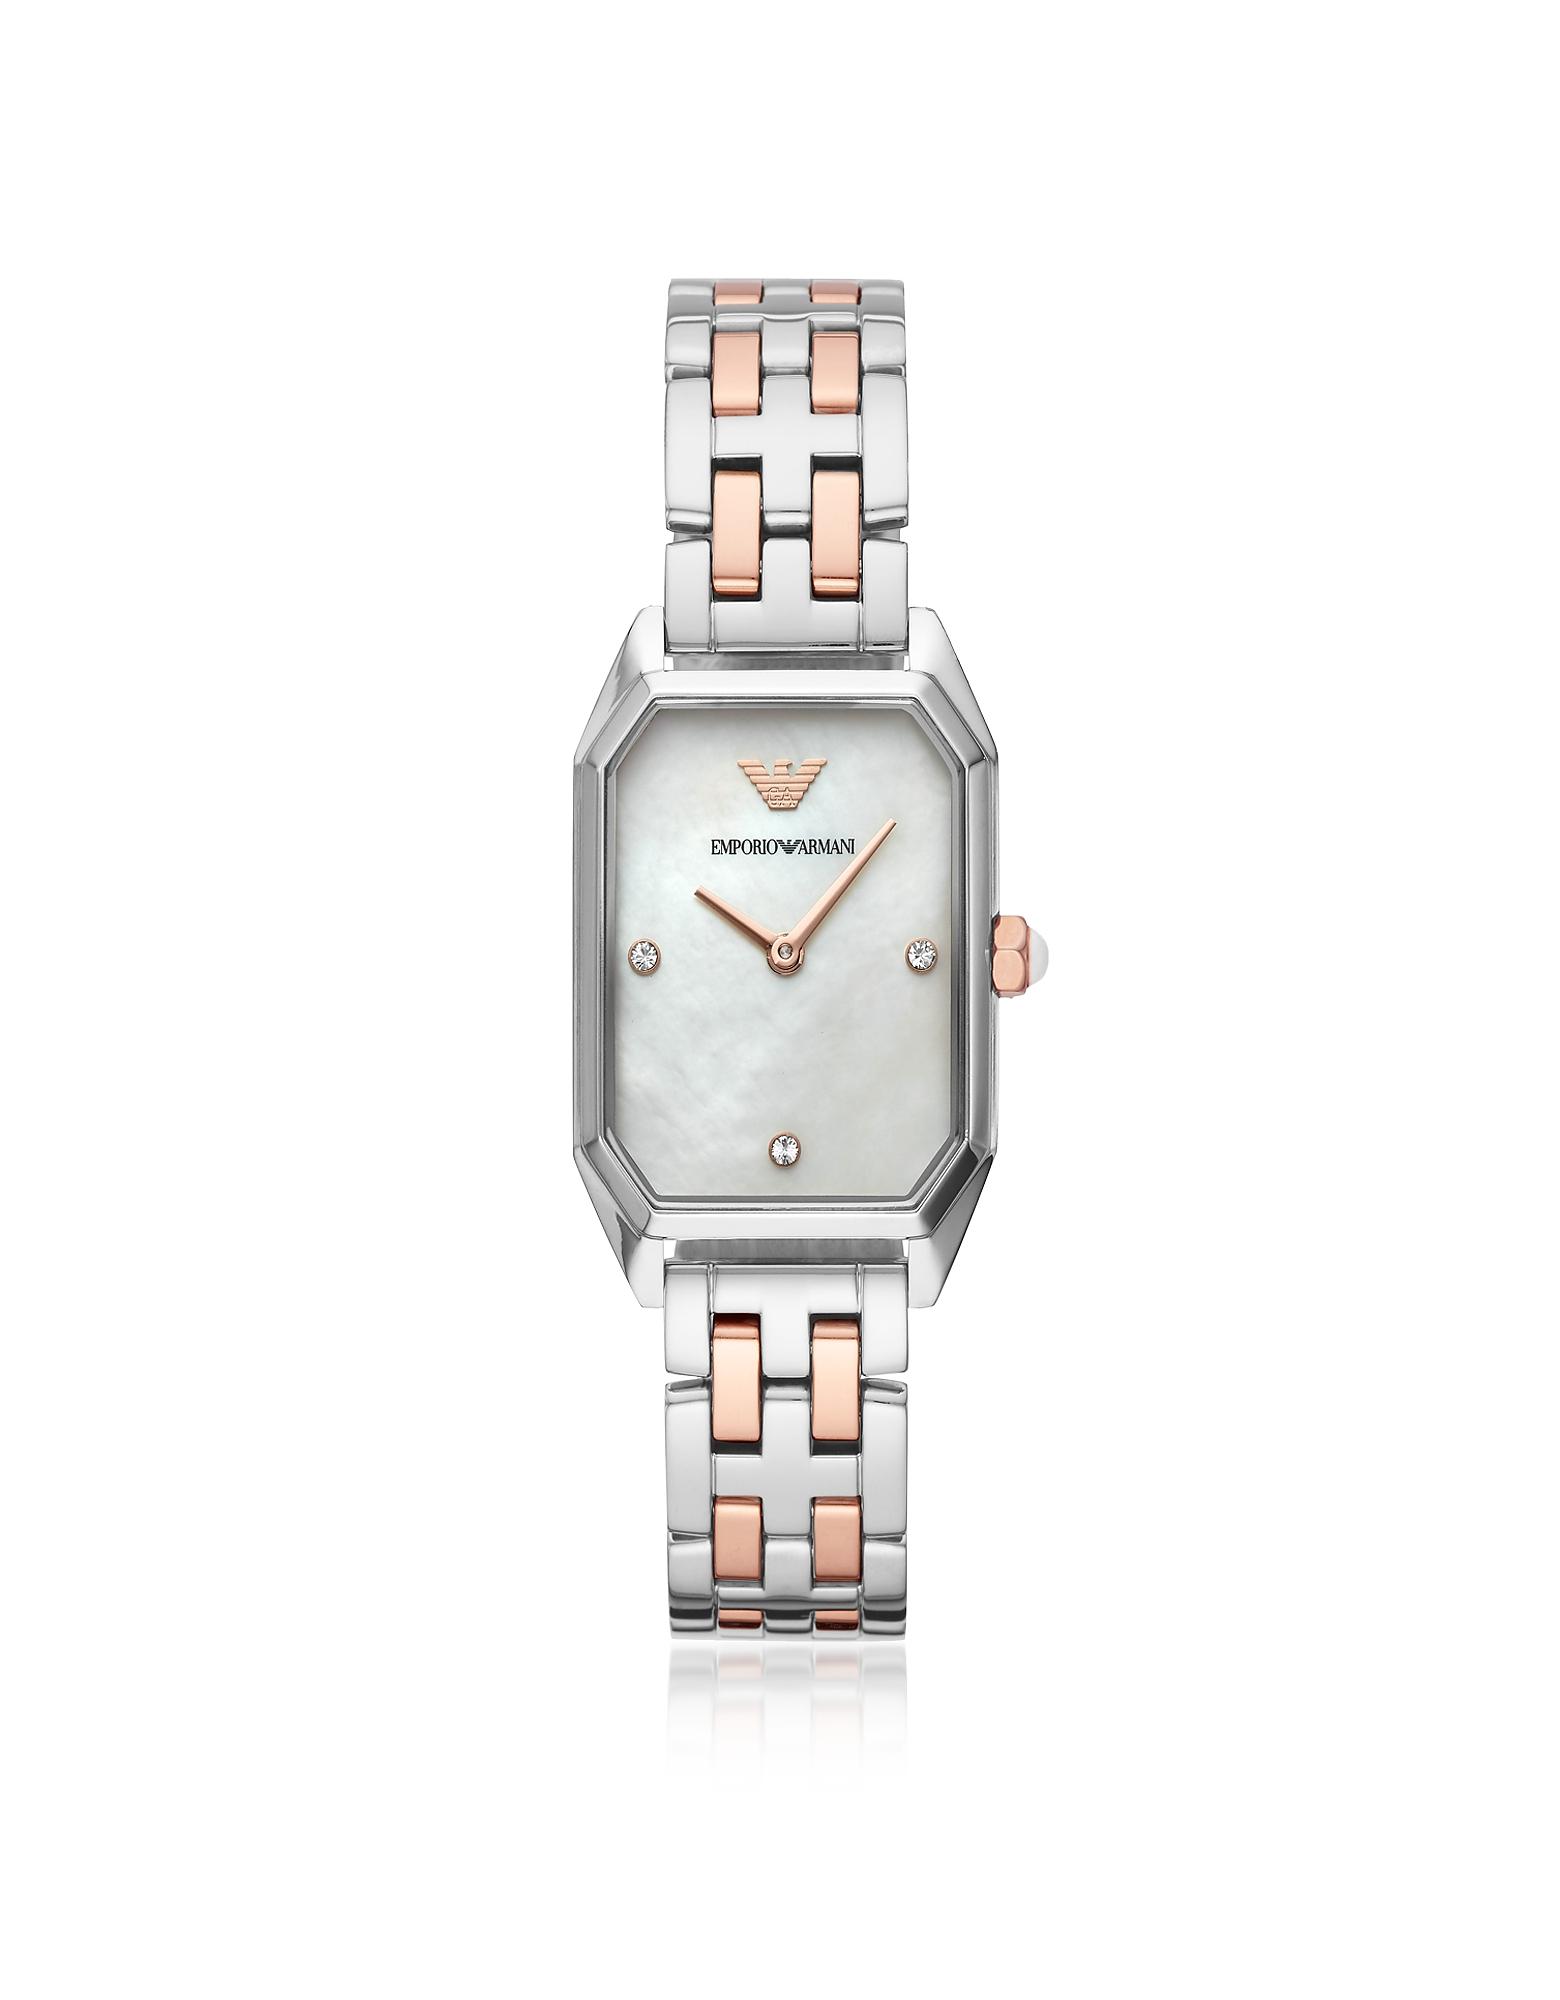 Emporio Armani Women's Watches, Gioia Two Tone Women's Watch